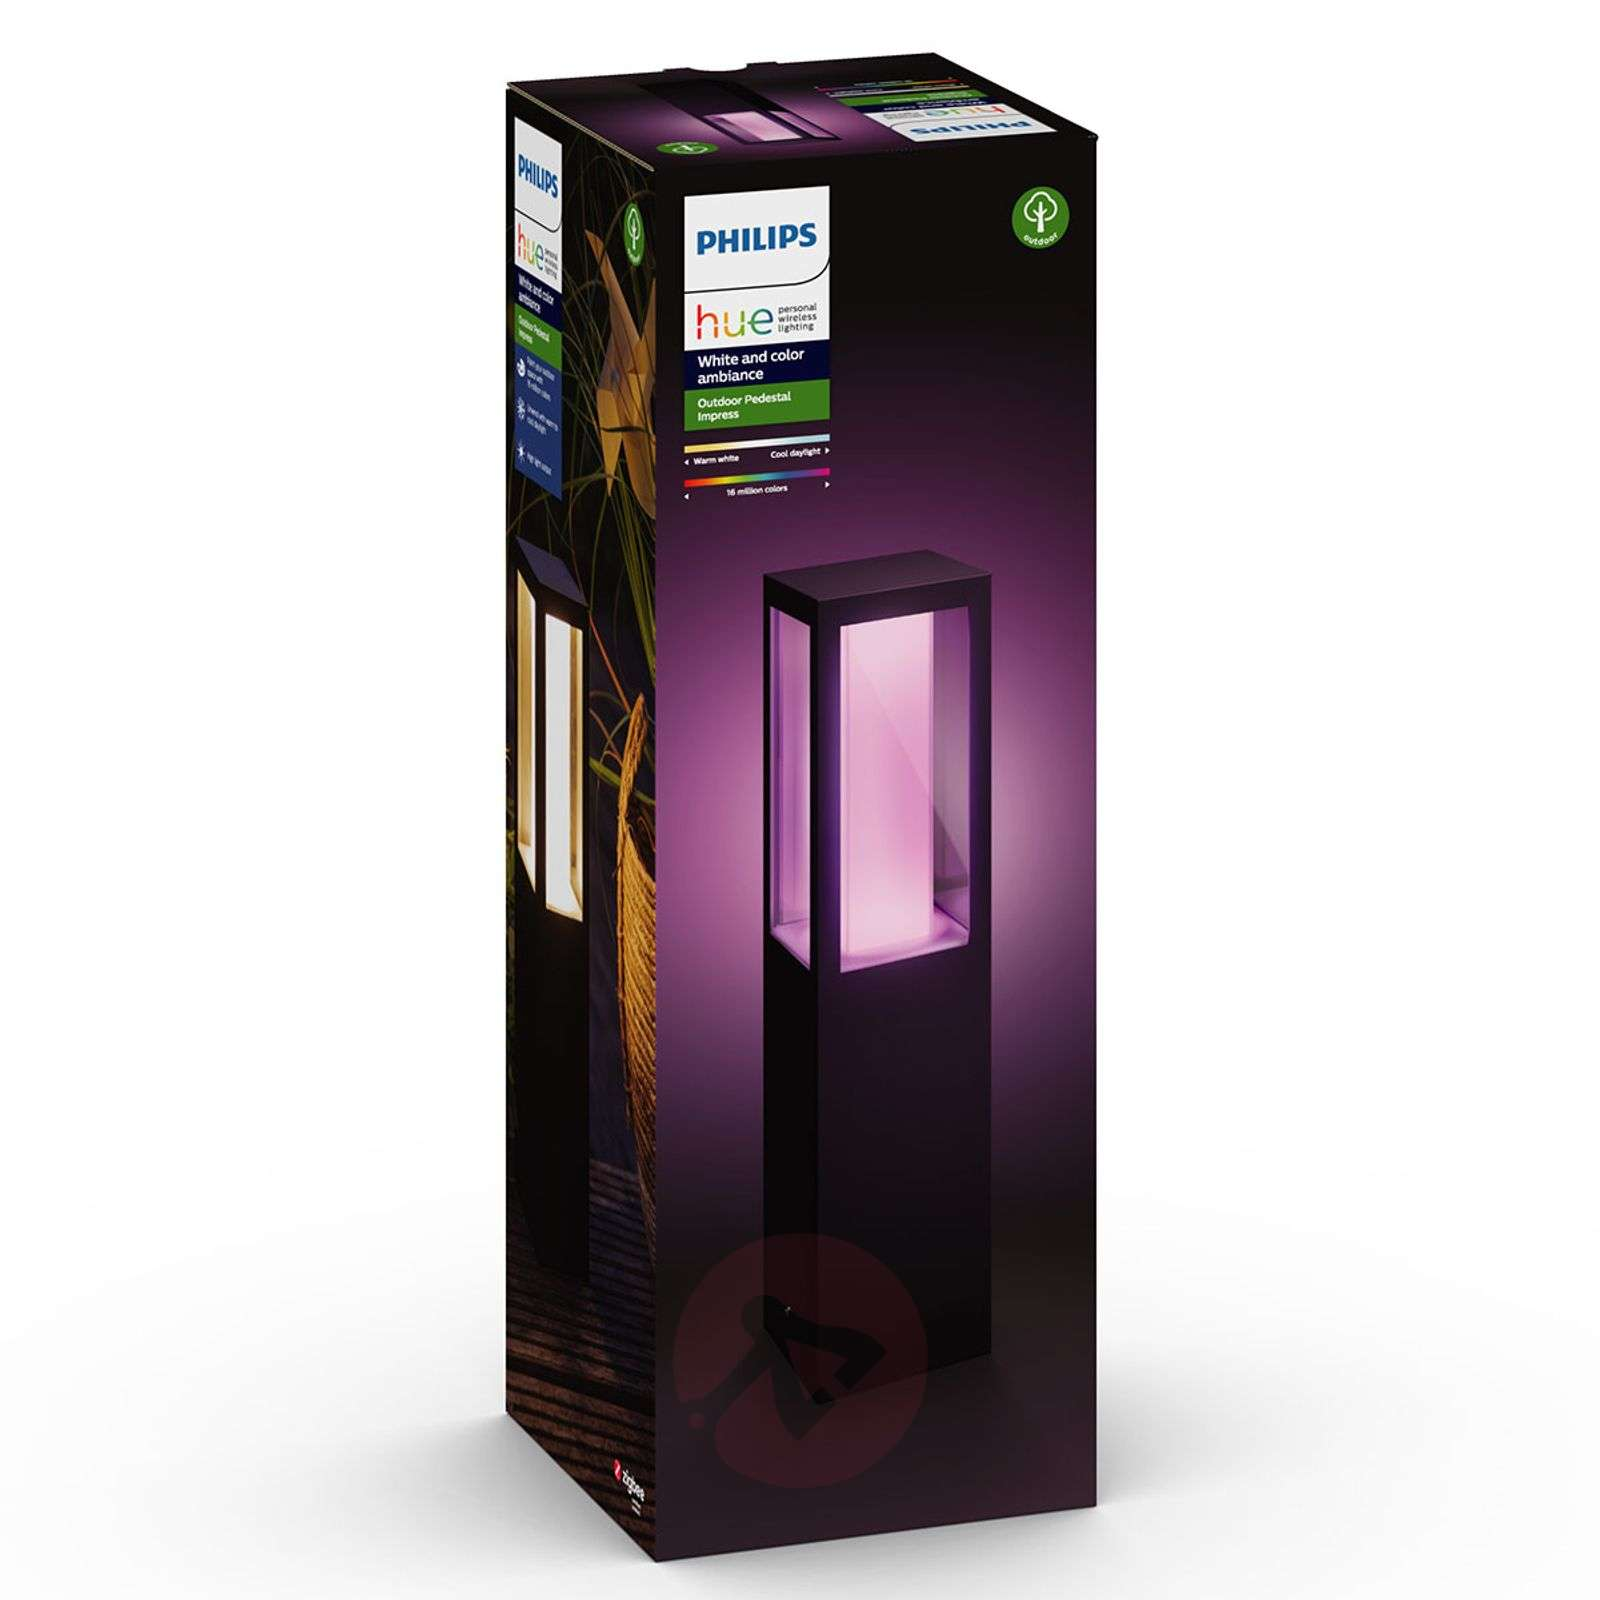 Philips Hue White+Color Impress LED-pollarivalo-7534110-02